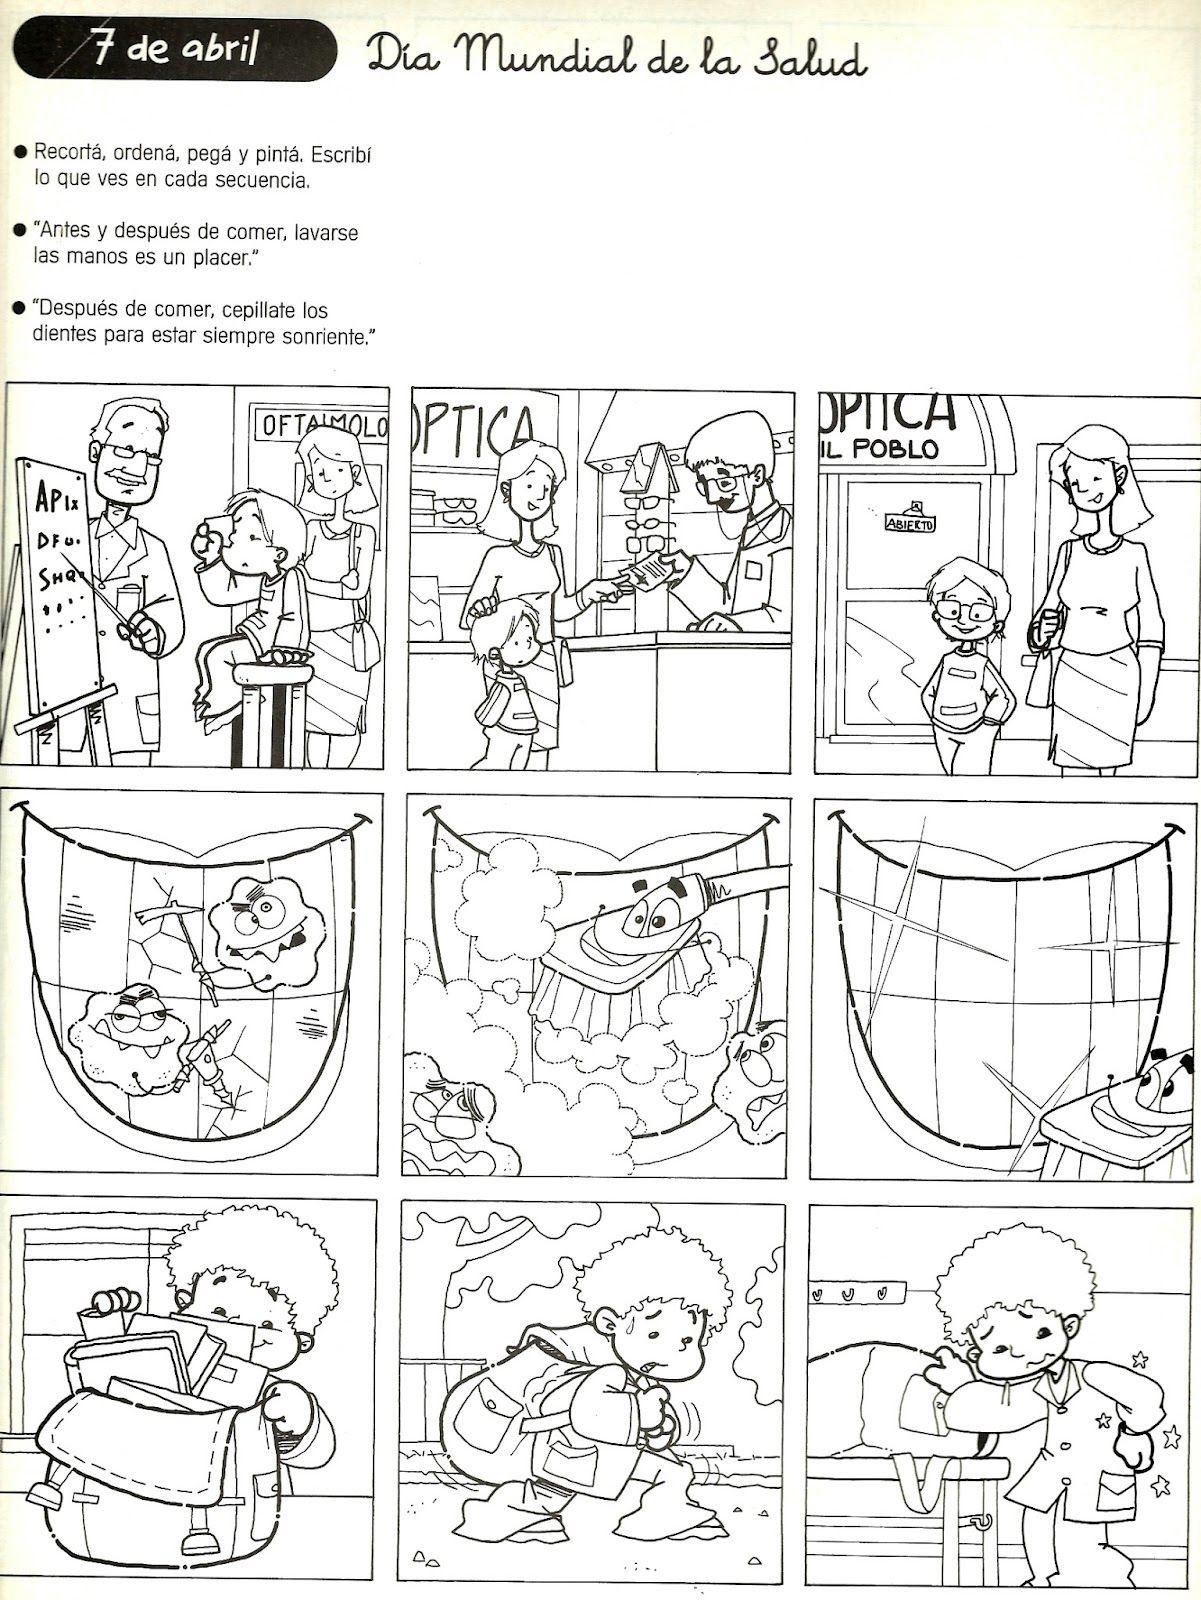 Pin de Neli en Formación | Pinterest | Formación, 7 de ...